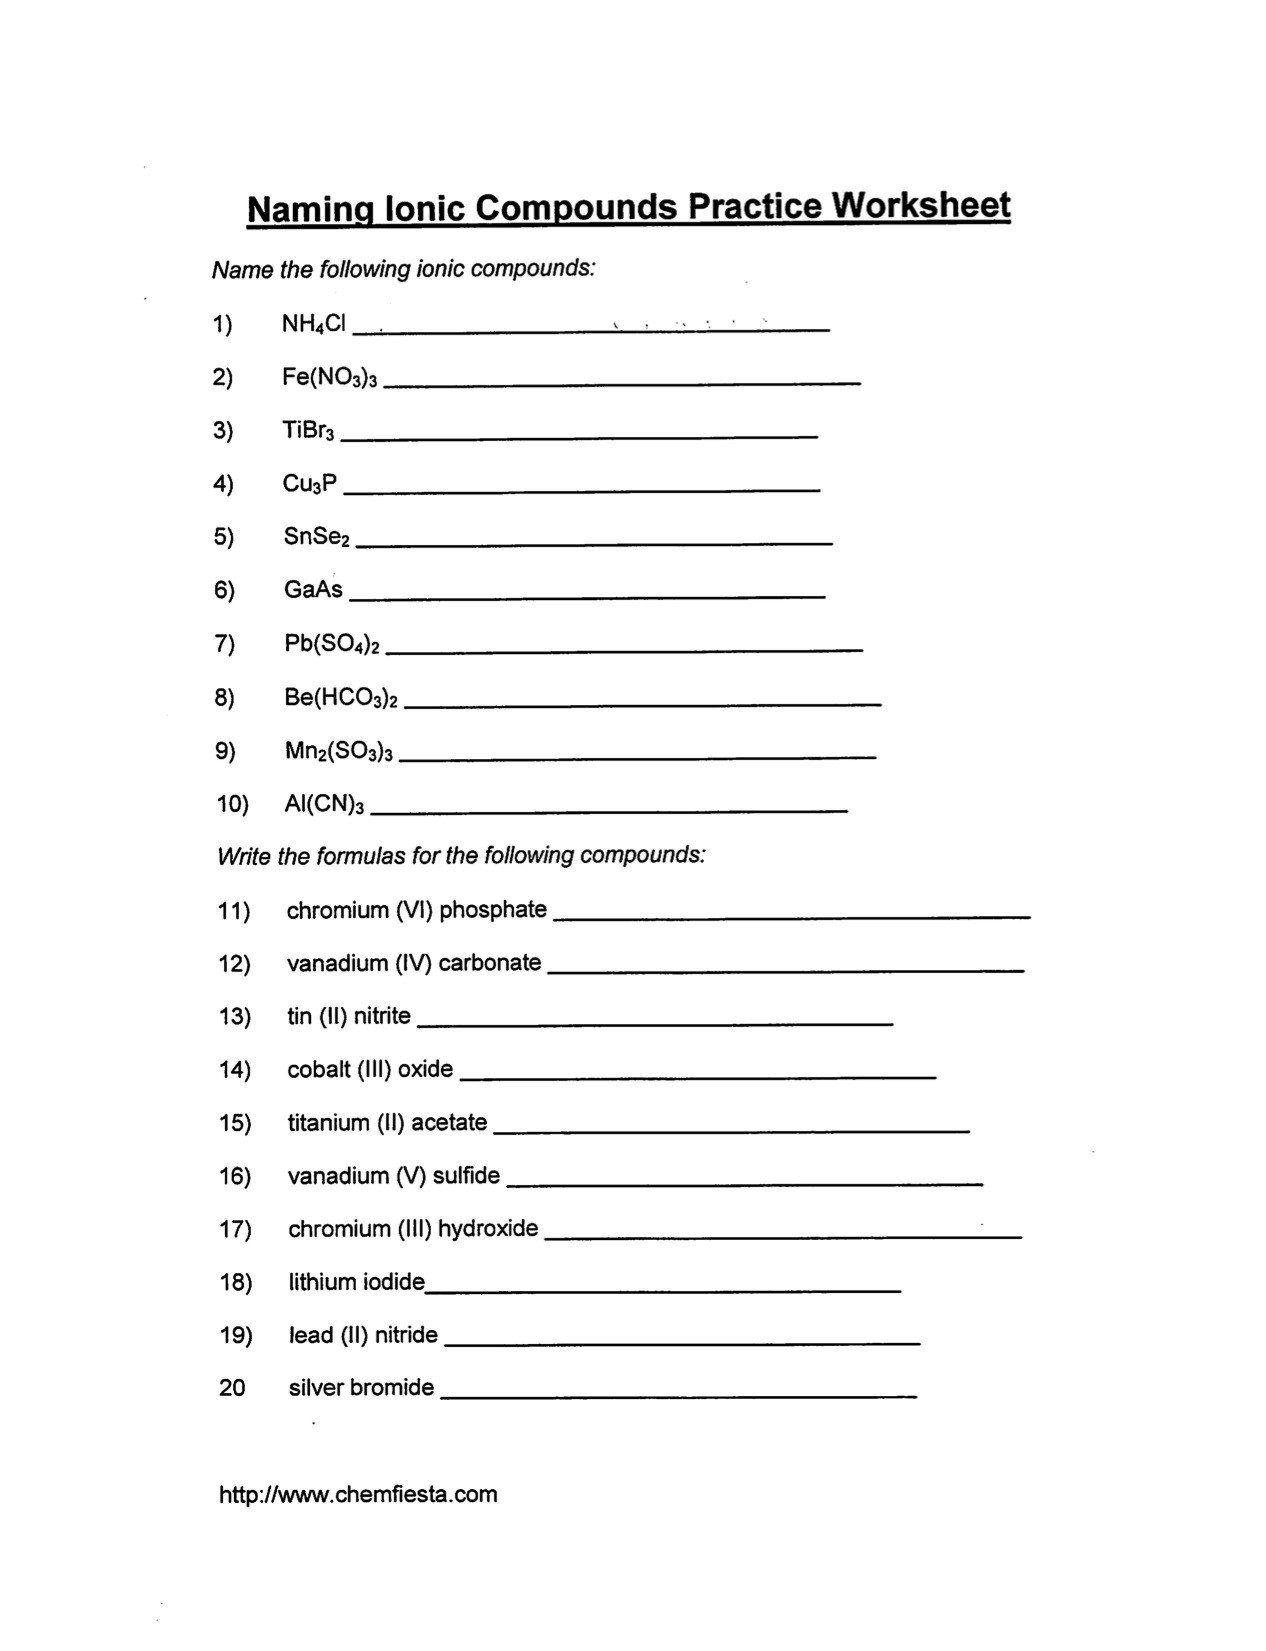 Writing Ionic Formulas Worksheet January